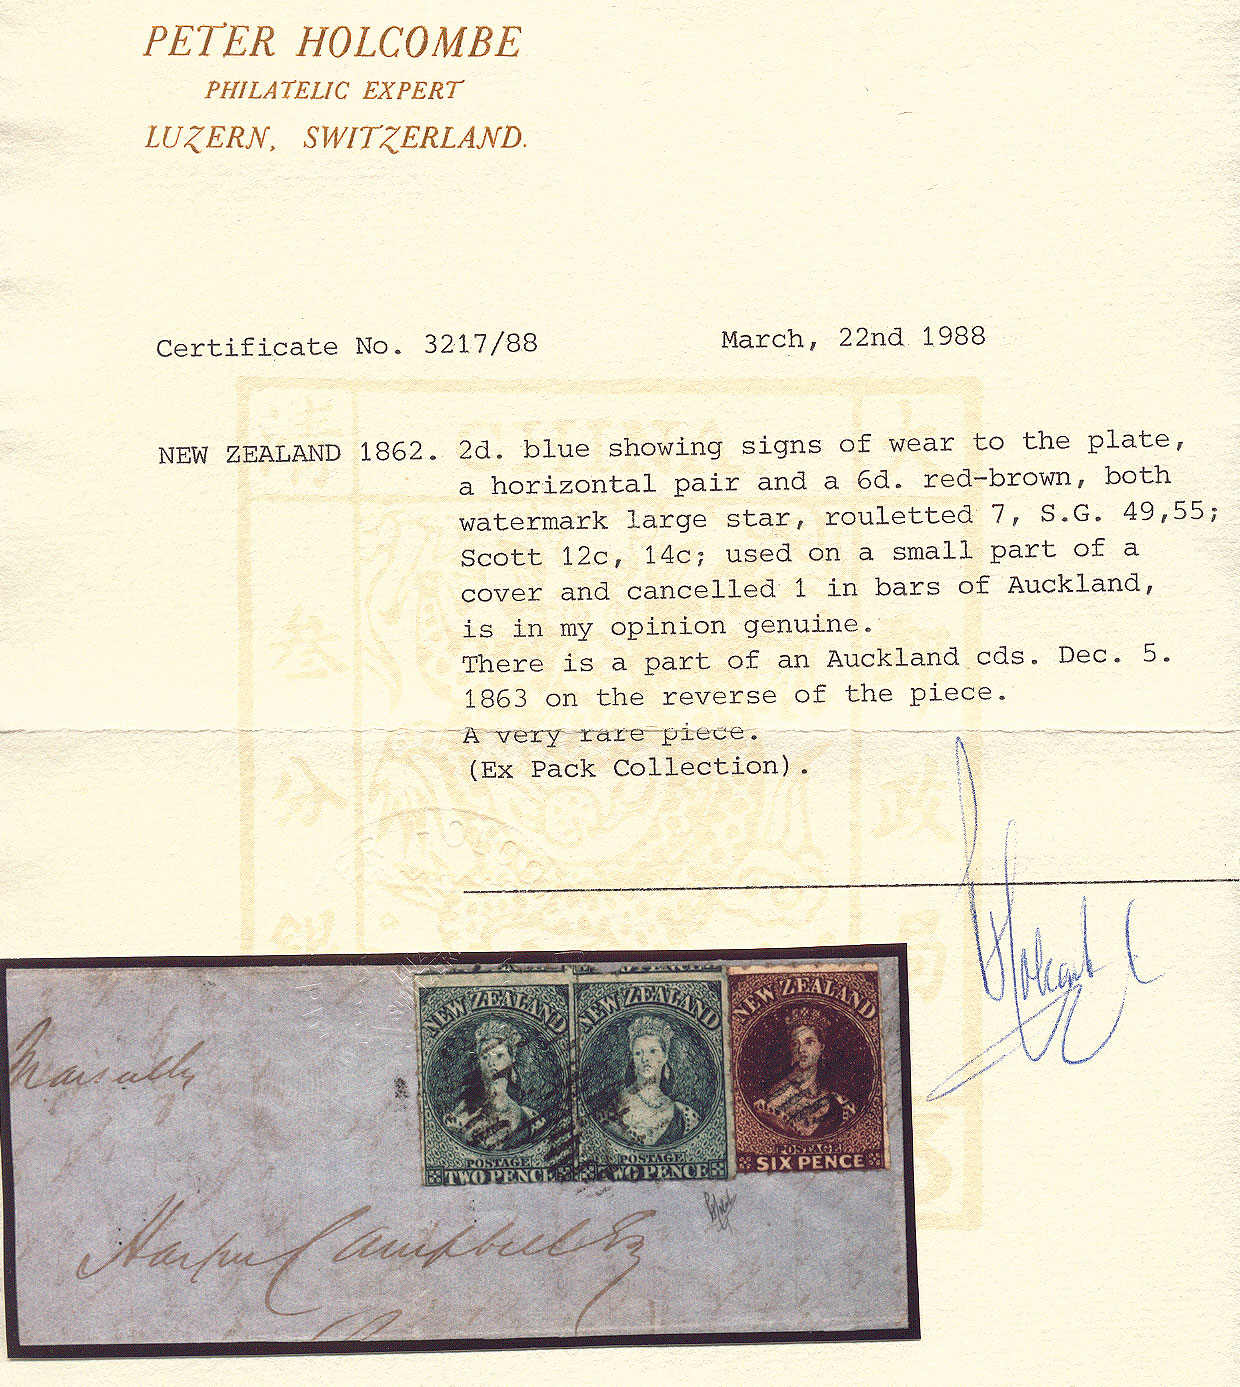 Lot 20016 - andere gebiete neuseeland -  classicphil GmbH 7'th classicphil Auction - Day 2